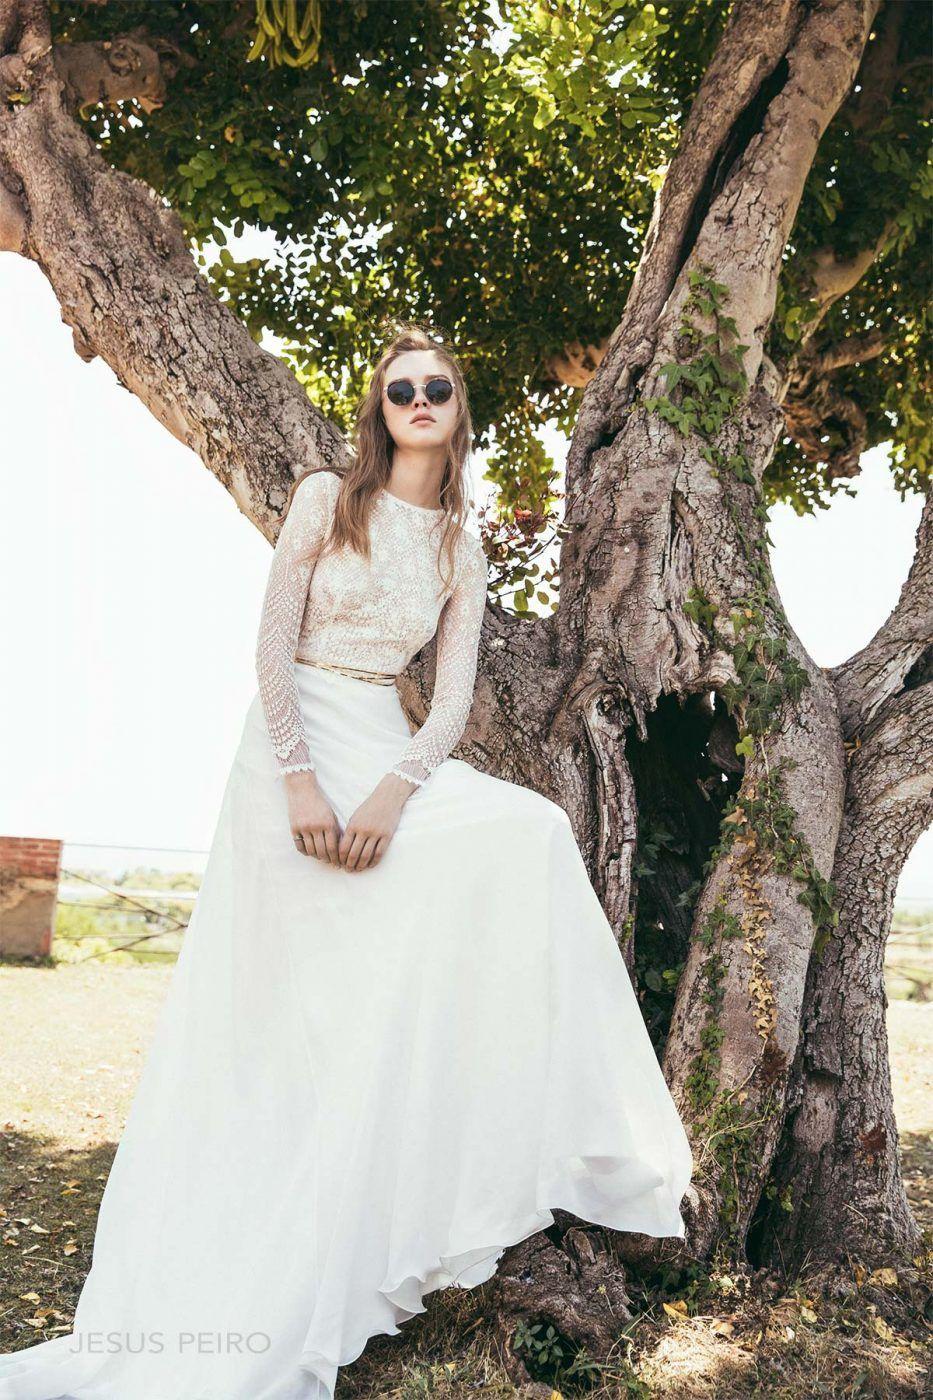 Style 8025 By Jesus Peiro Metropolis Collection 2018 Jenny Packham Bridal Wedding Dresses: Smoking Brides Wedding Dress At Websimilar.org